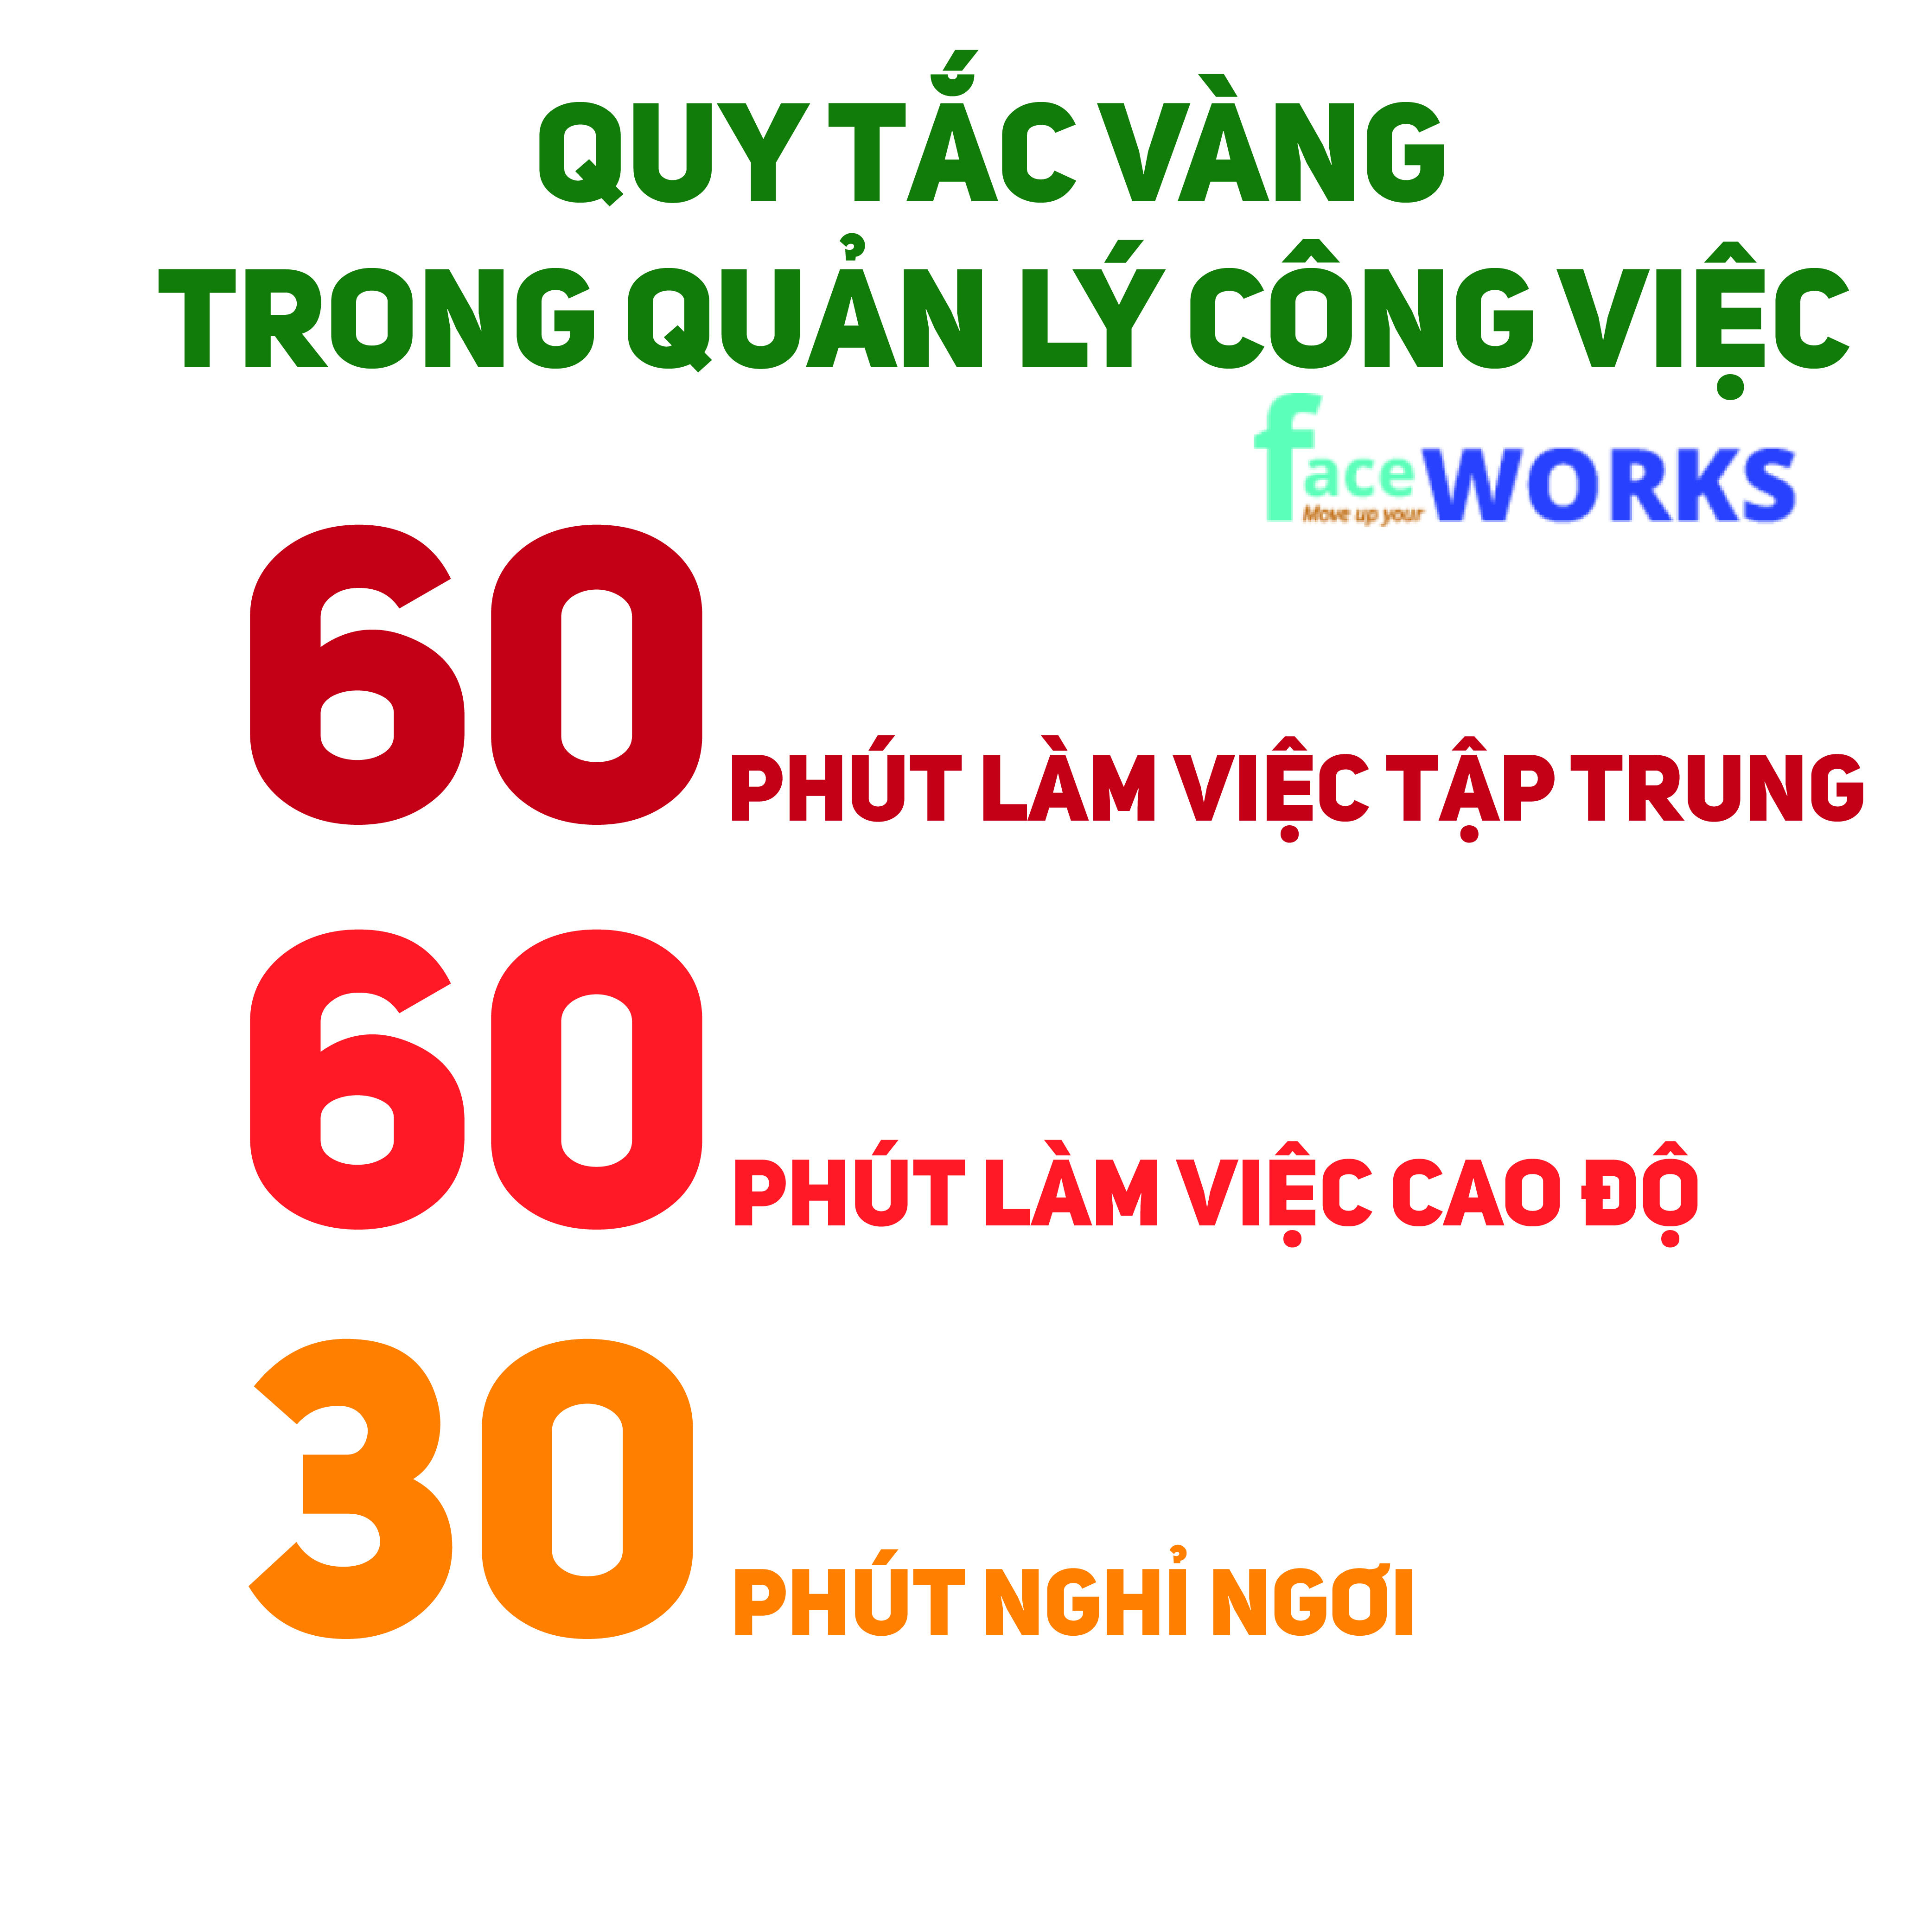 QUY TAC VANG 60-60-30-01